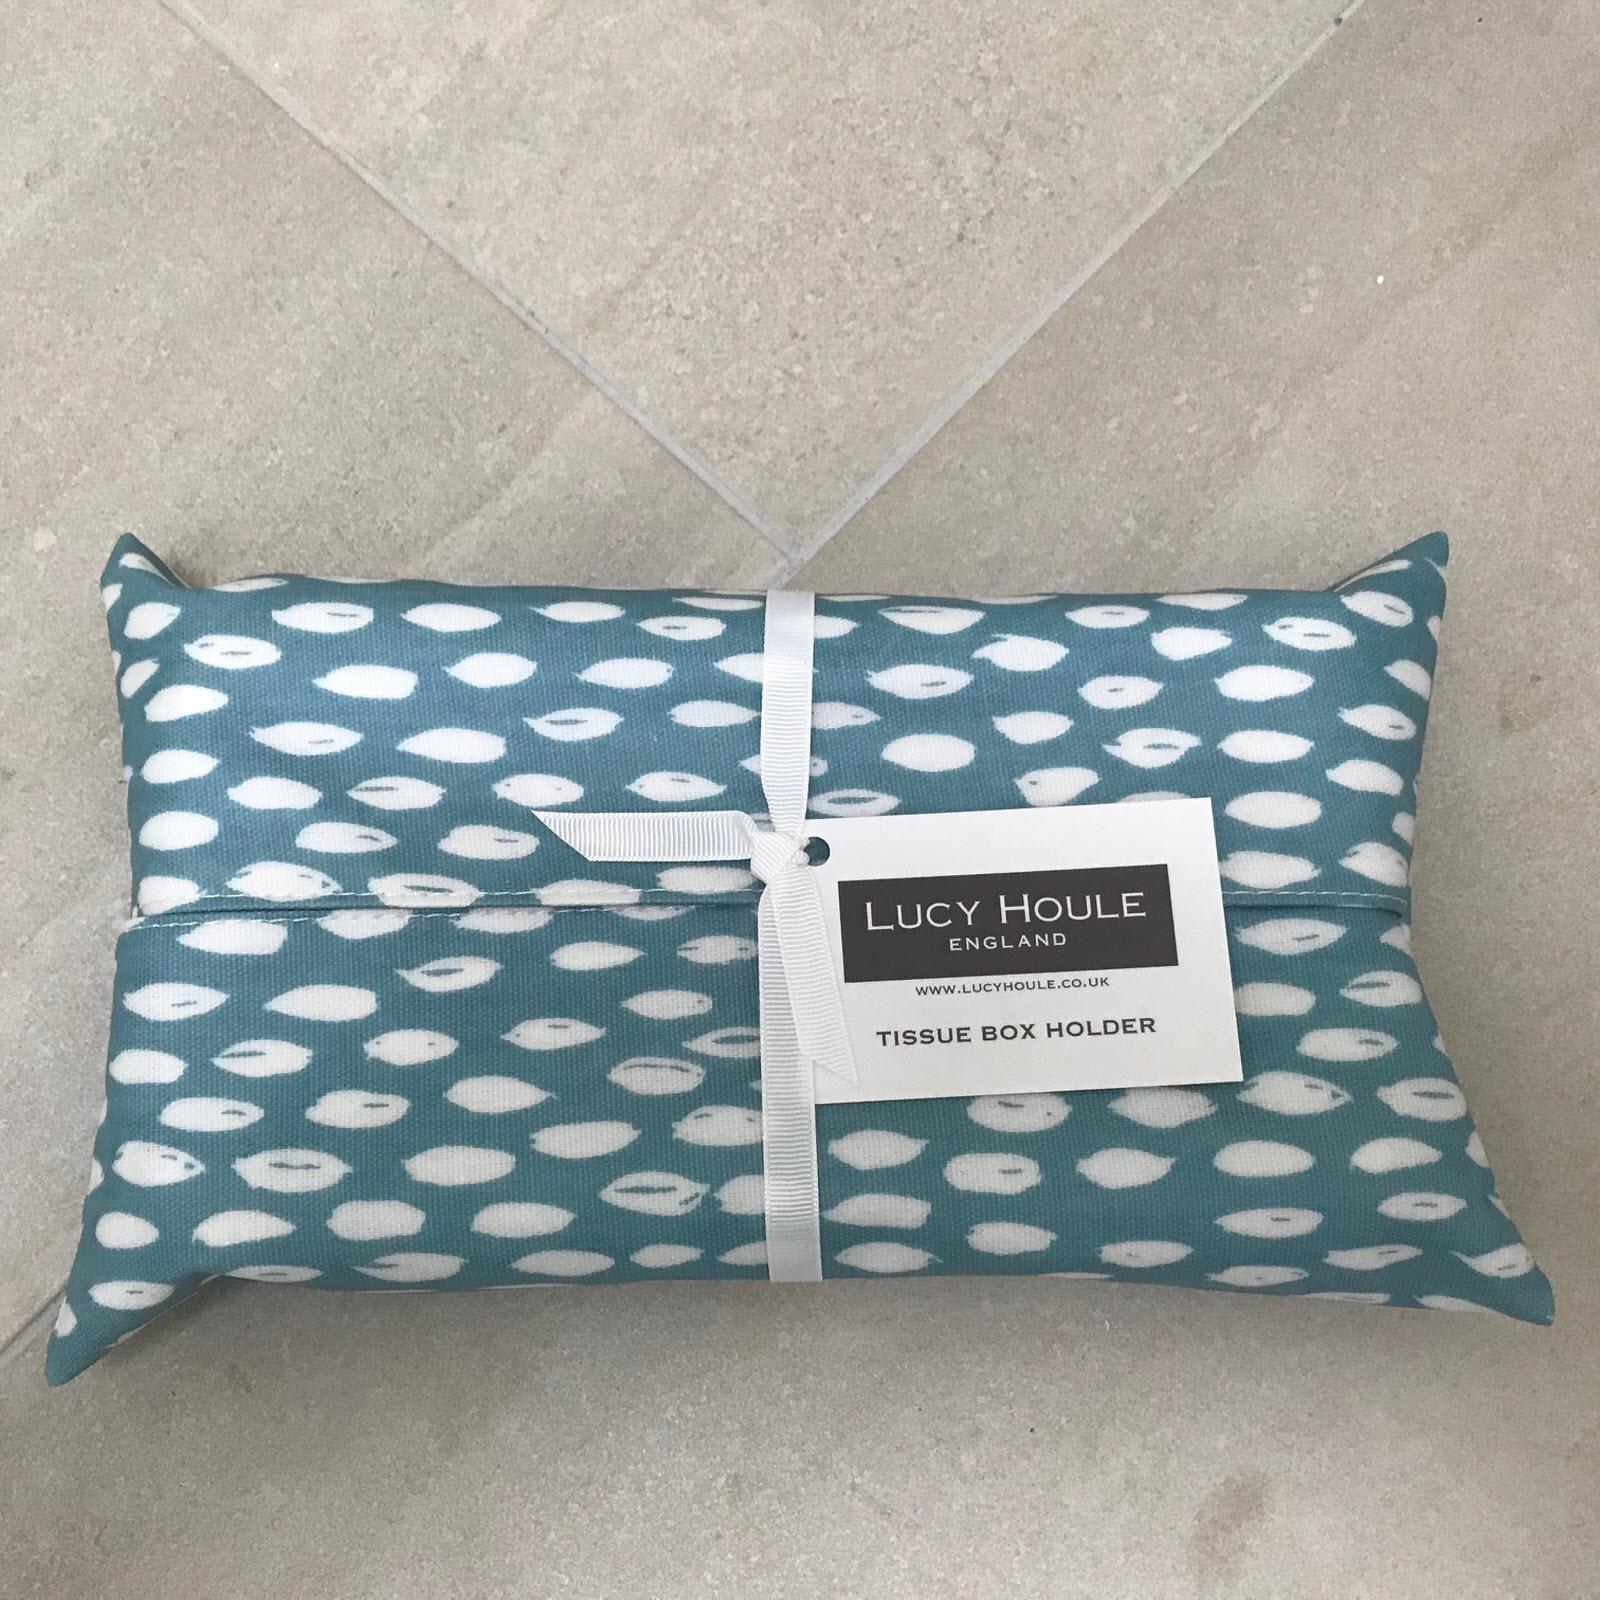 Aqua Feather Tissue Box Holder